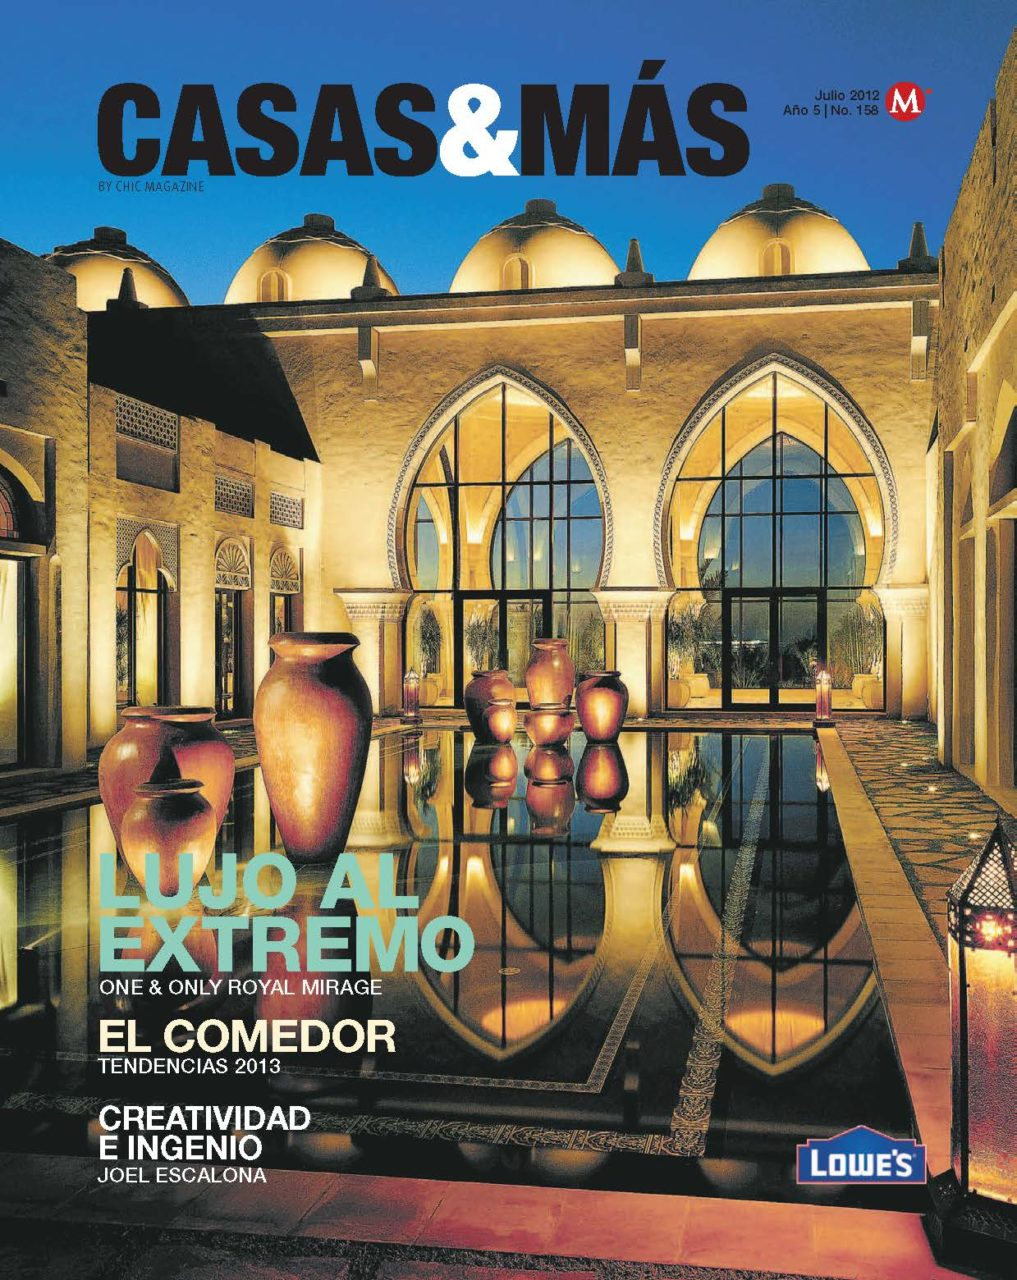 http://www.saota.com/wp-content/uploads/2018/01/2012_July_CasasMas_SAOTA_Page_1.jpg